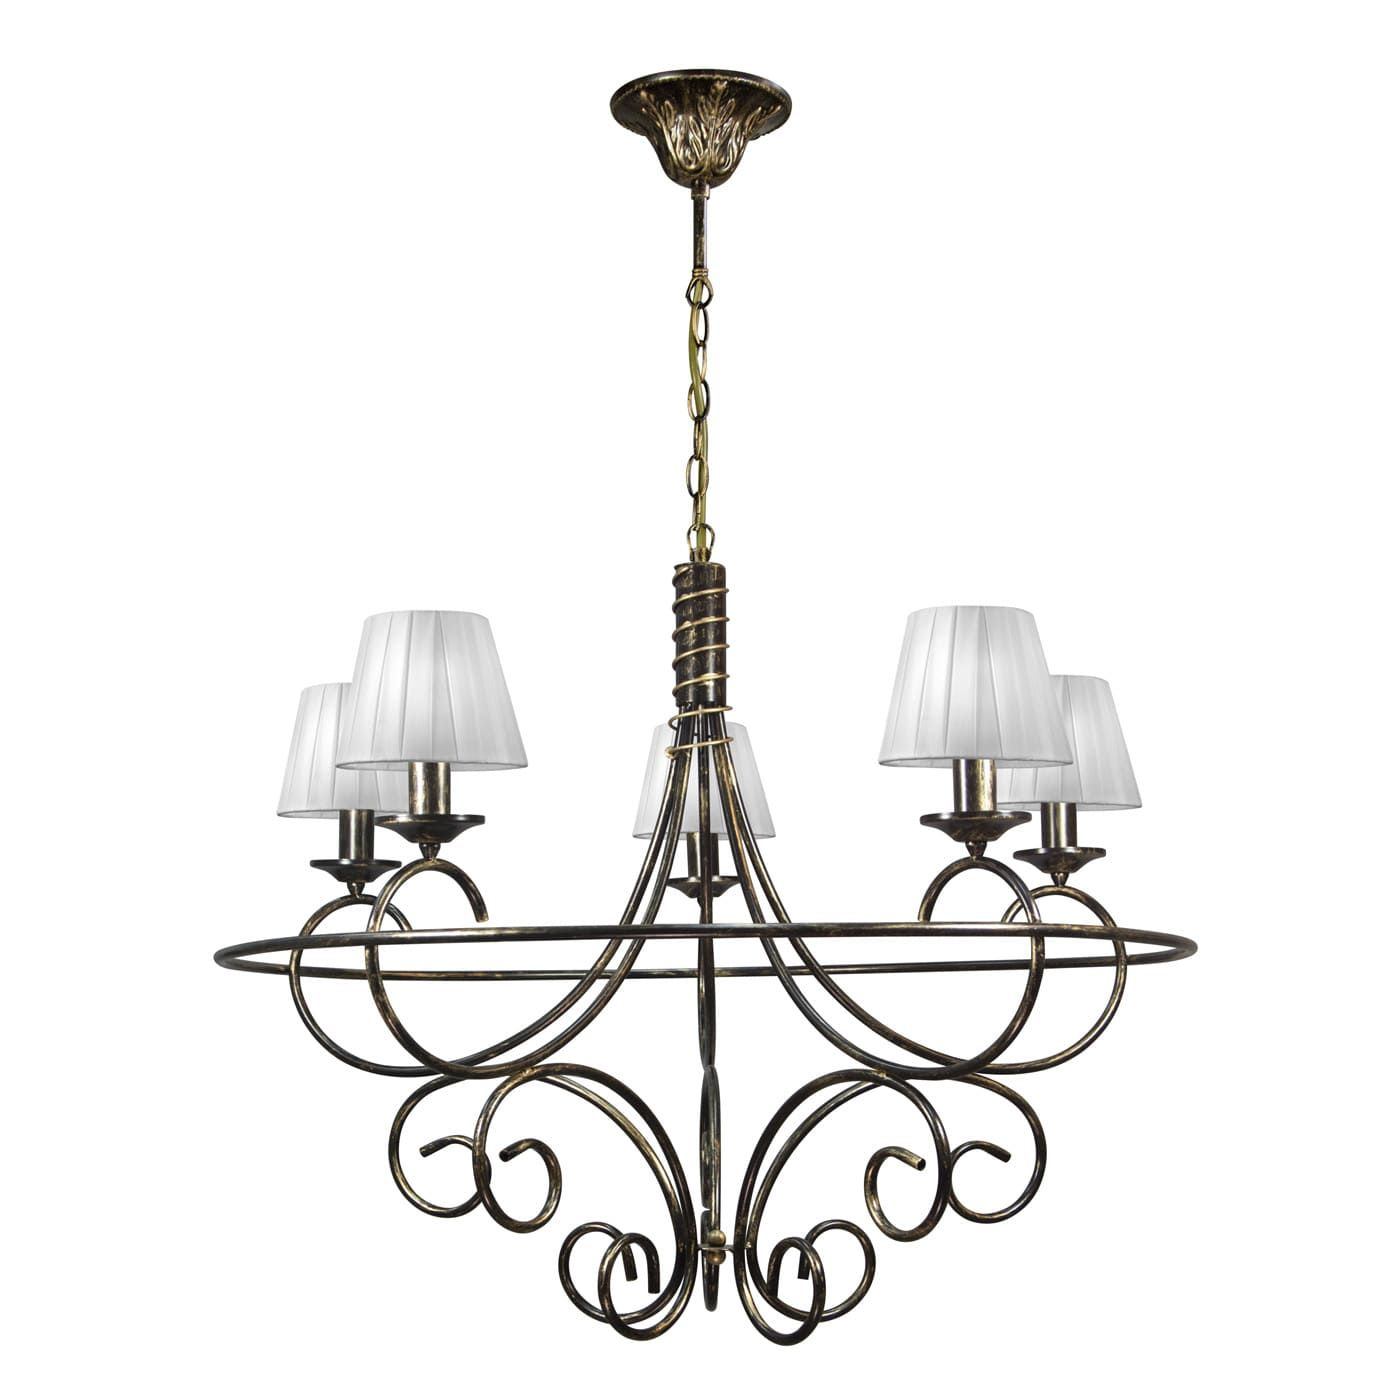 PETRASVET / Pendant chandelier S3128-5, 5xE14 max. 60W